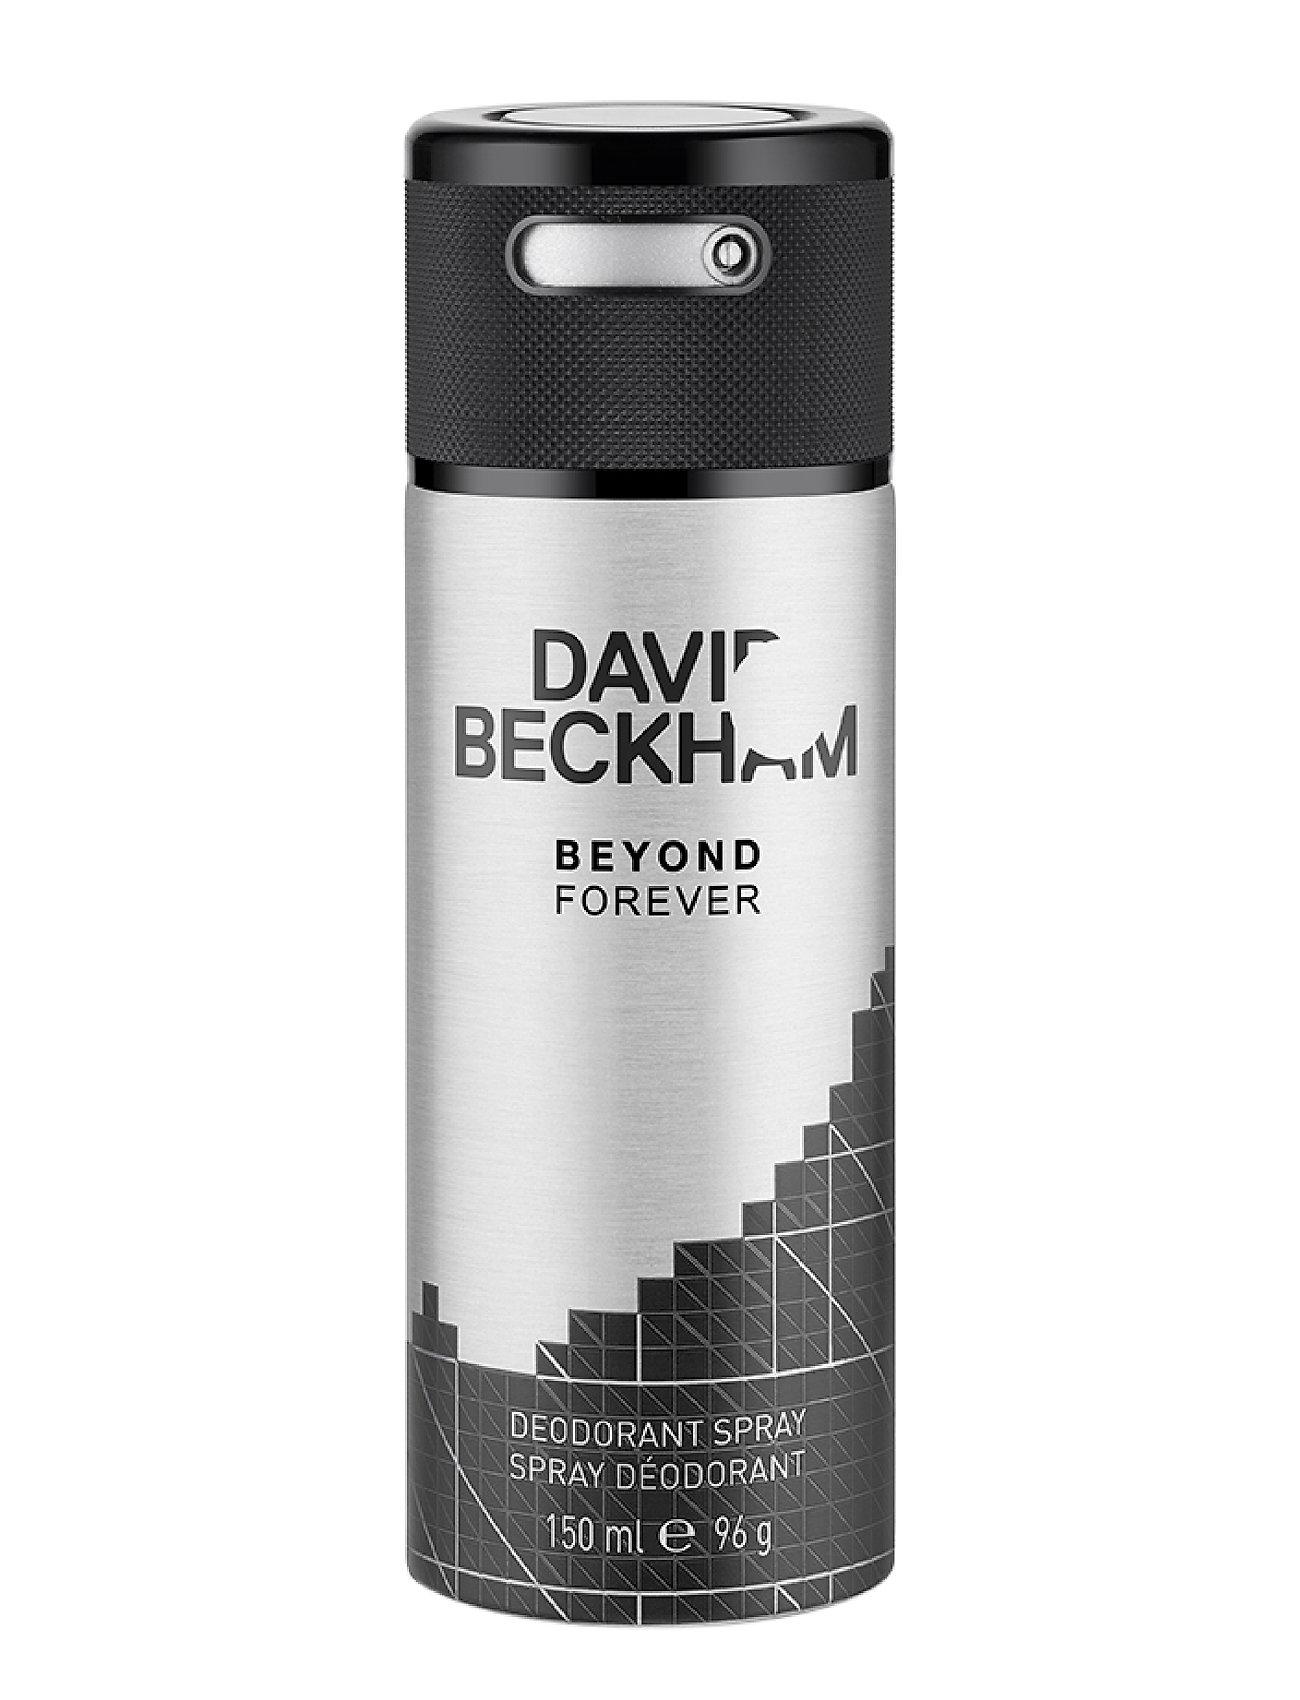 David Beckham BEYOND FOREVER DEODORANT SPRAY